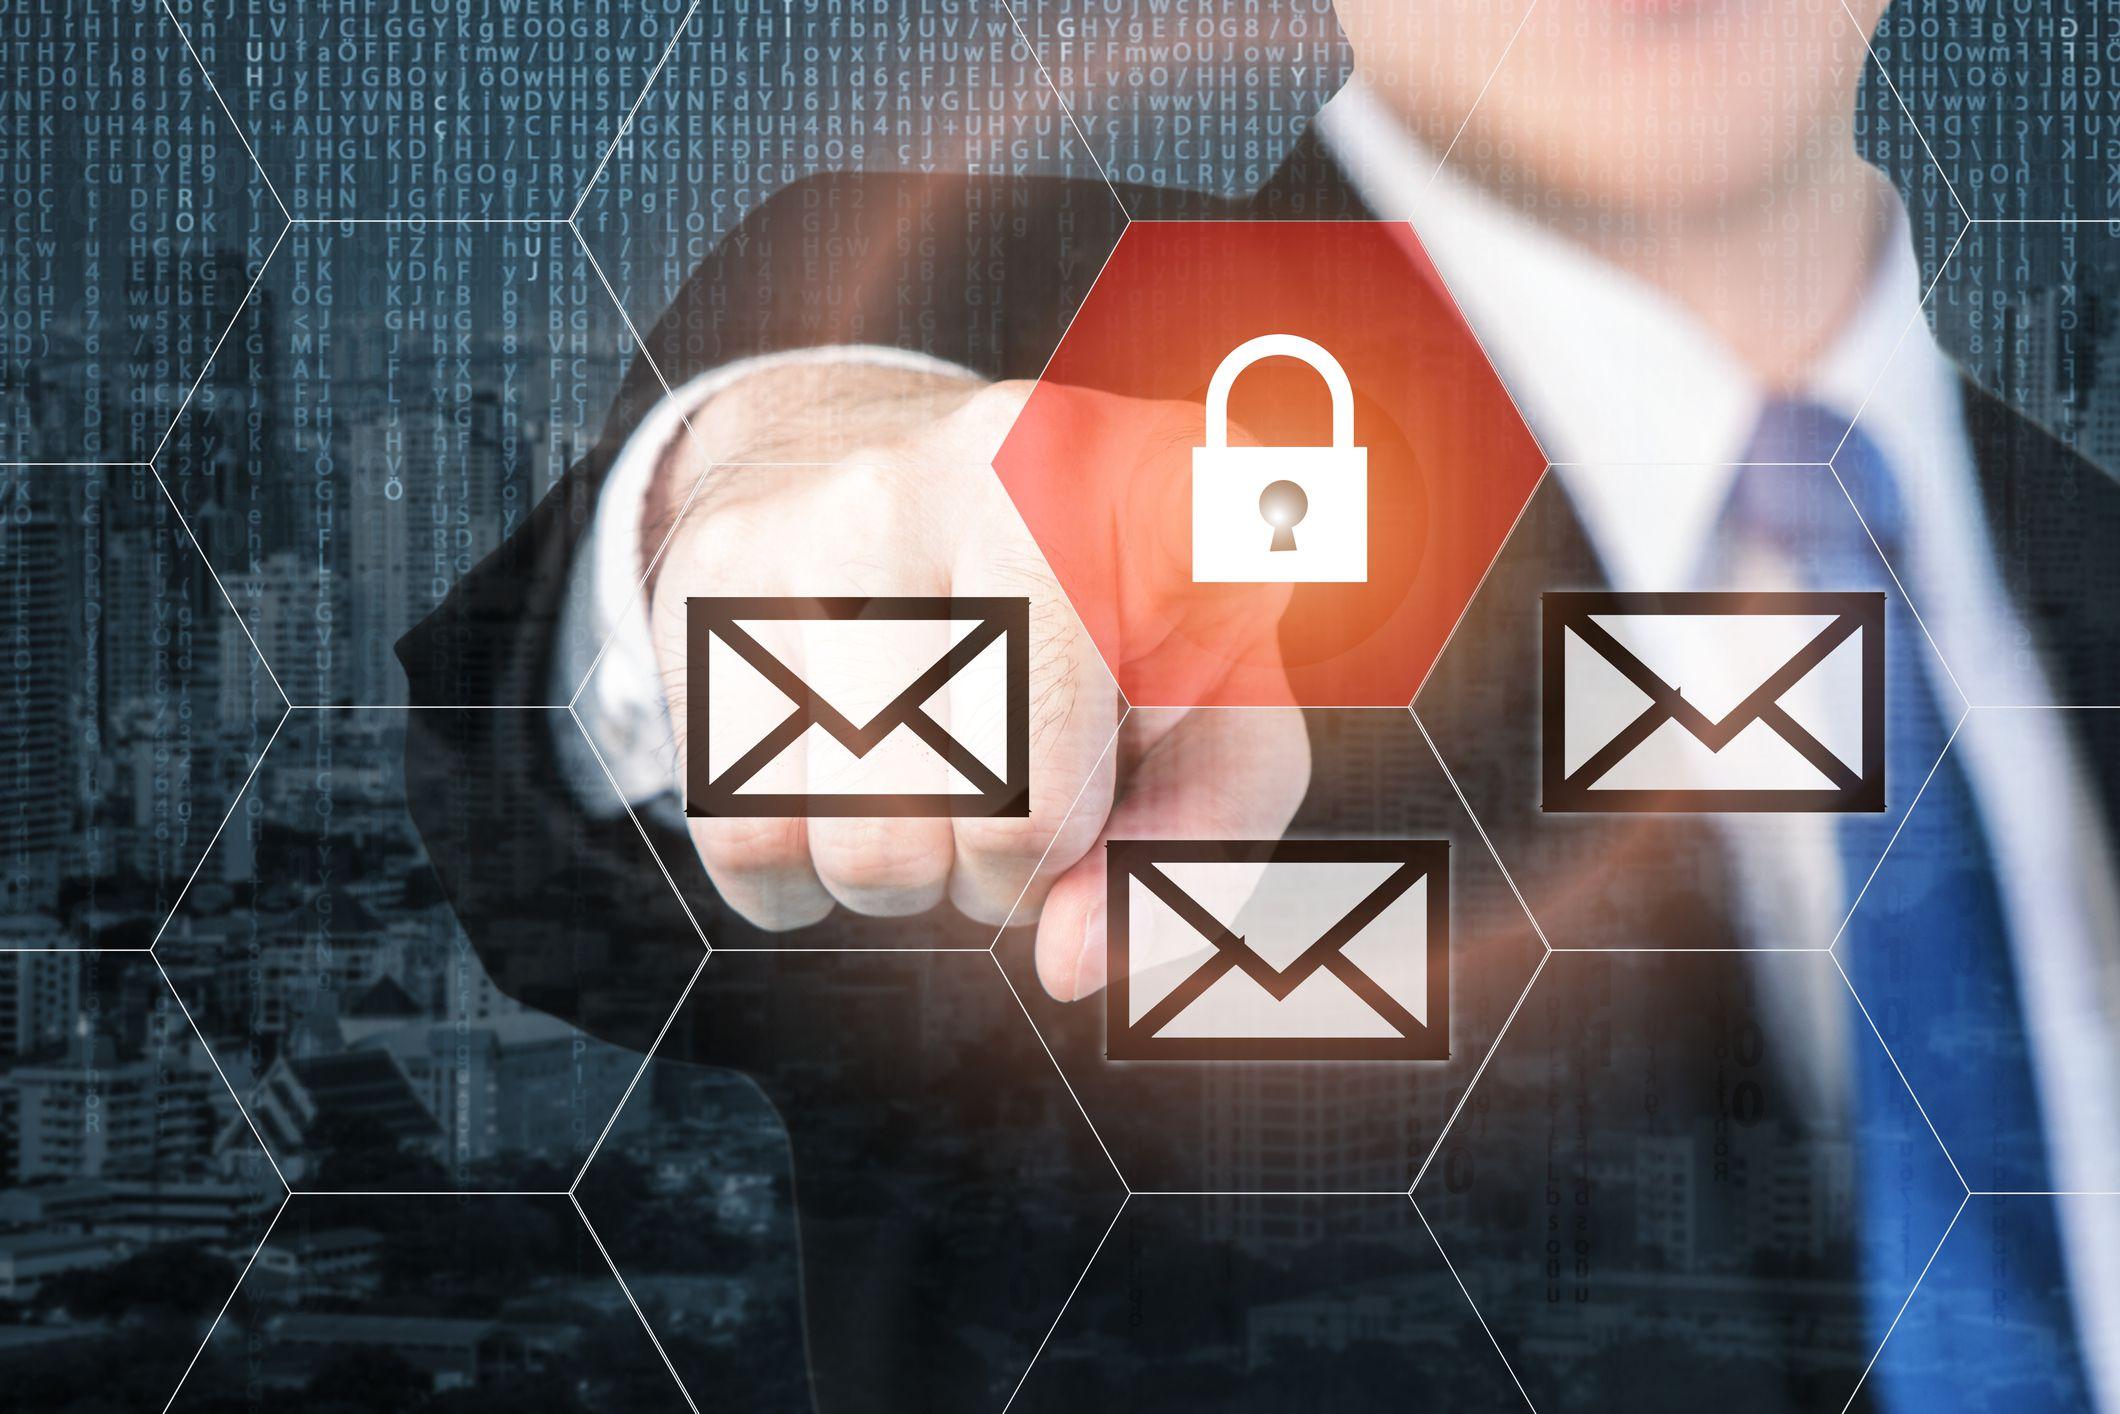 change gmail password on iphone 6 plus